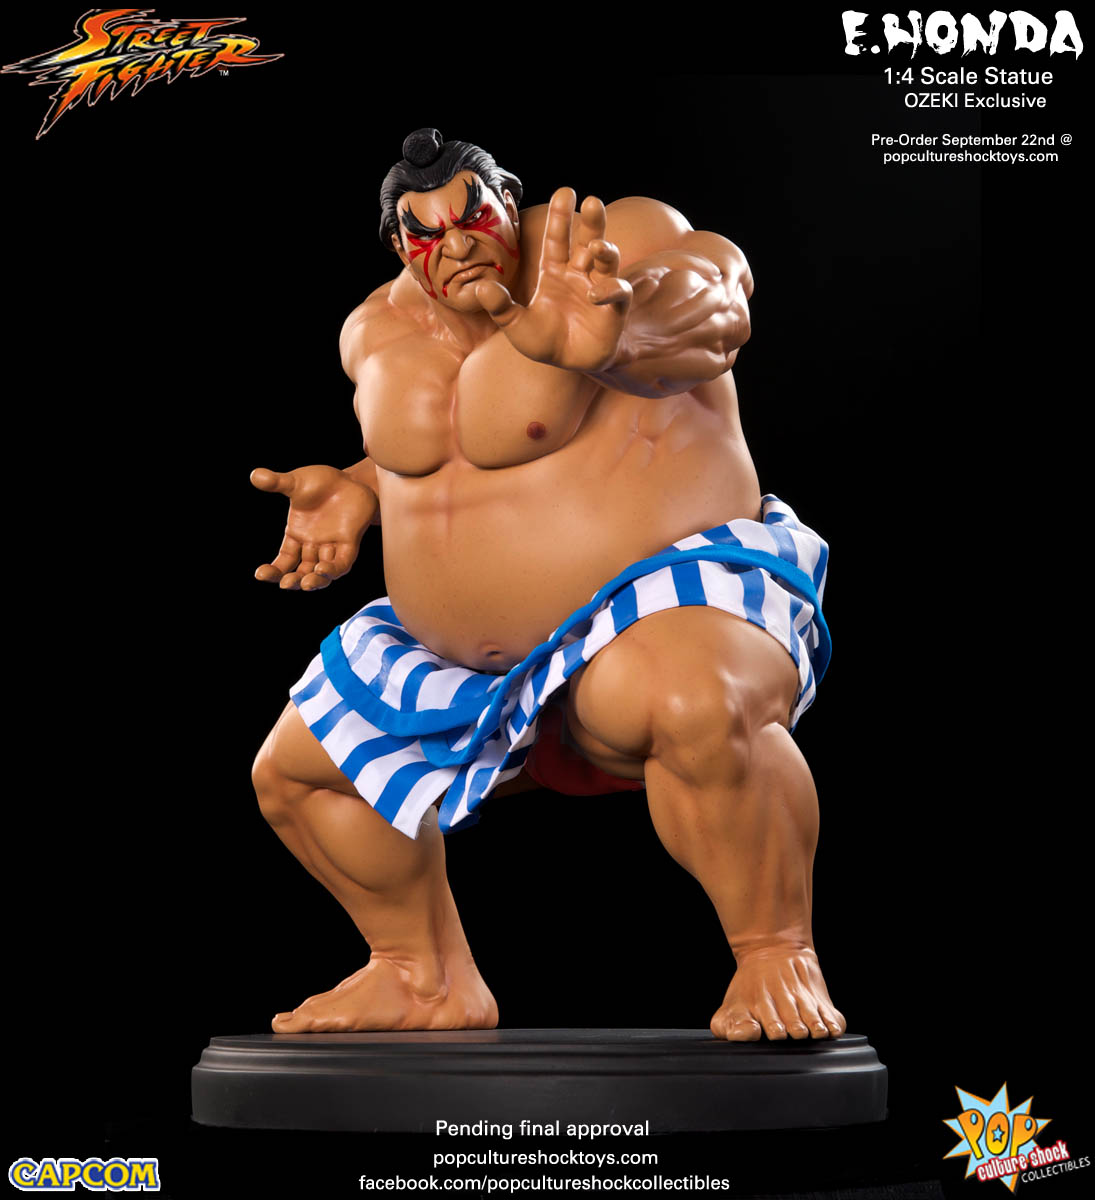 [Pop Culture Shock] Street Fighter: E. Honda 1/4 Statue - Página 3 Street-Fighter-E.-Honda-ozeki-Statue-002